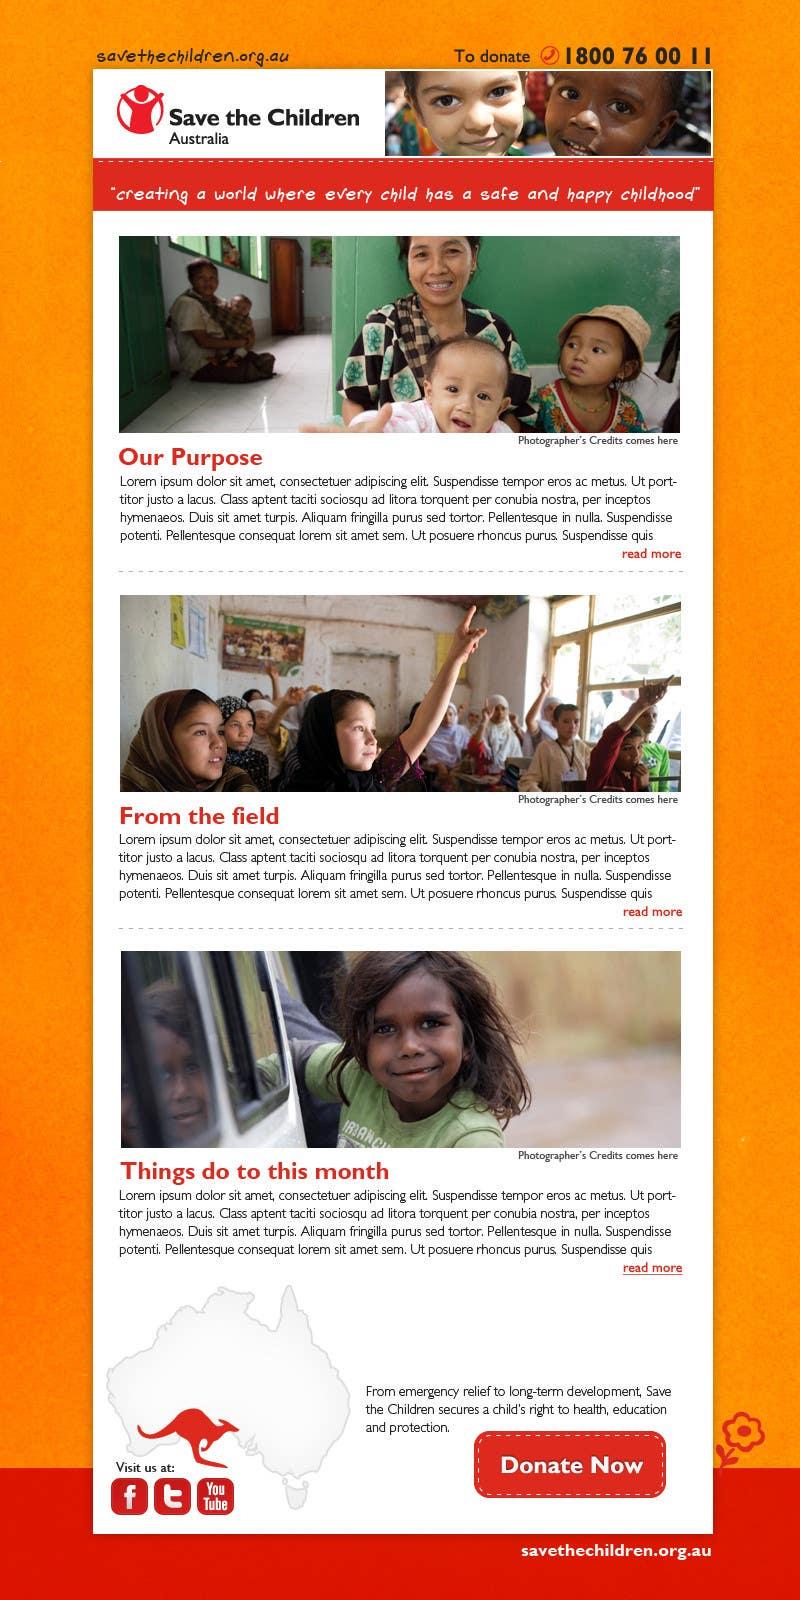 Konkurrenceindlæg #47 for HTML Email for Save the Children Australia